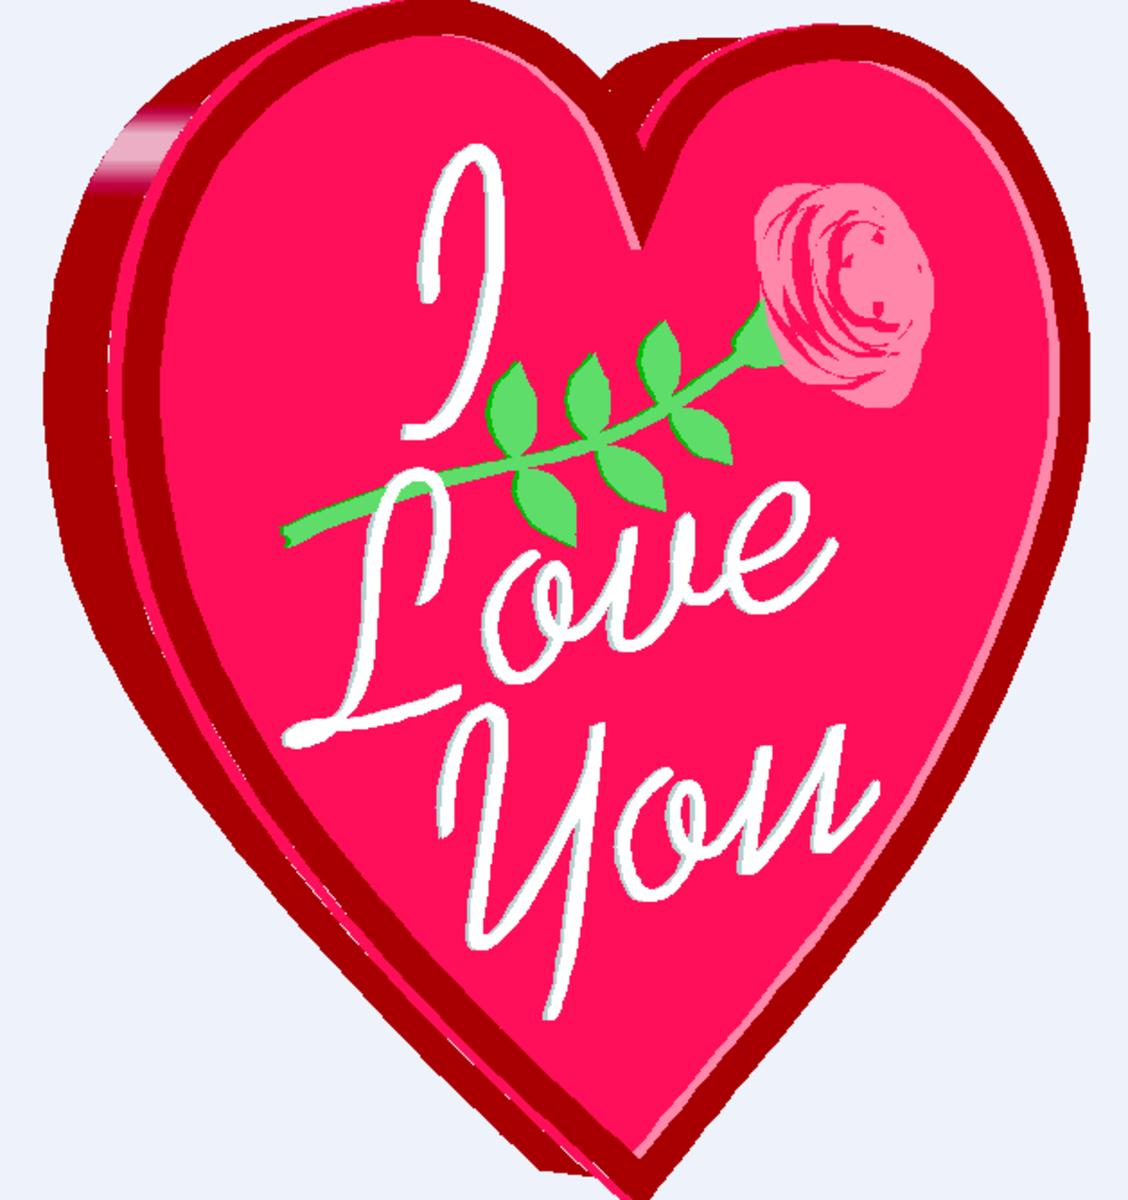 I Love You Heart Sketch